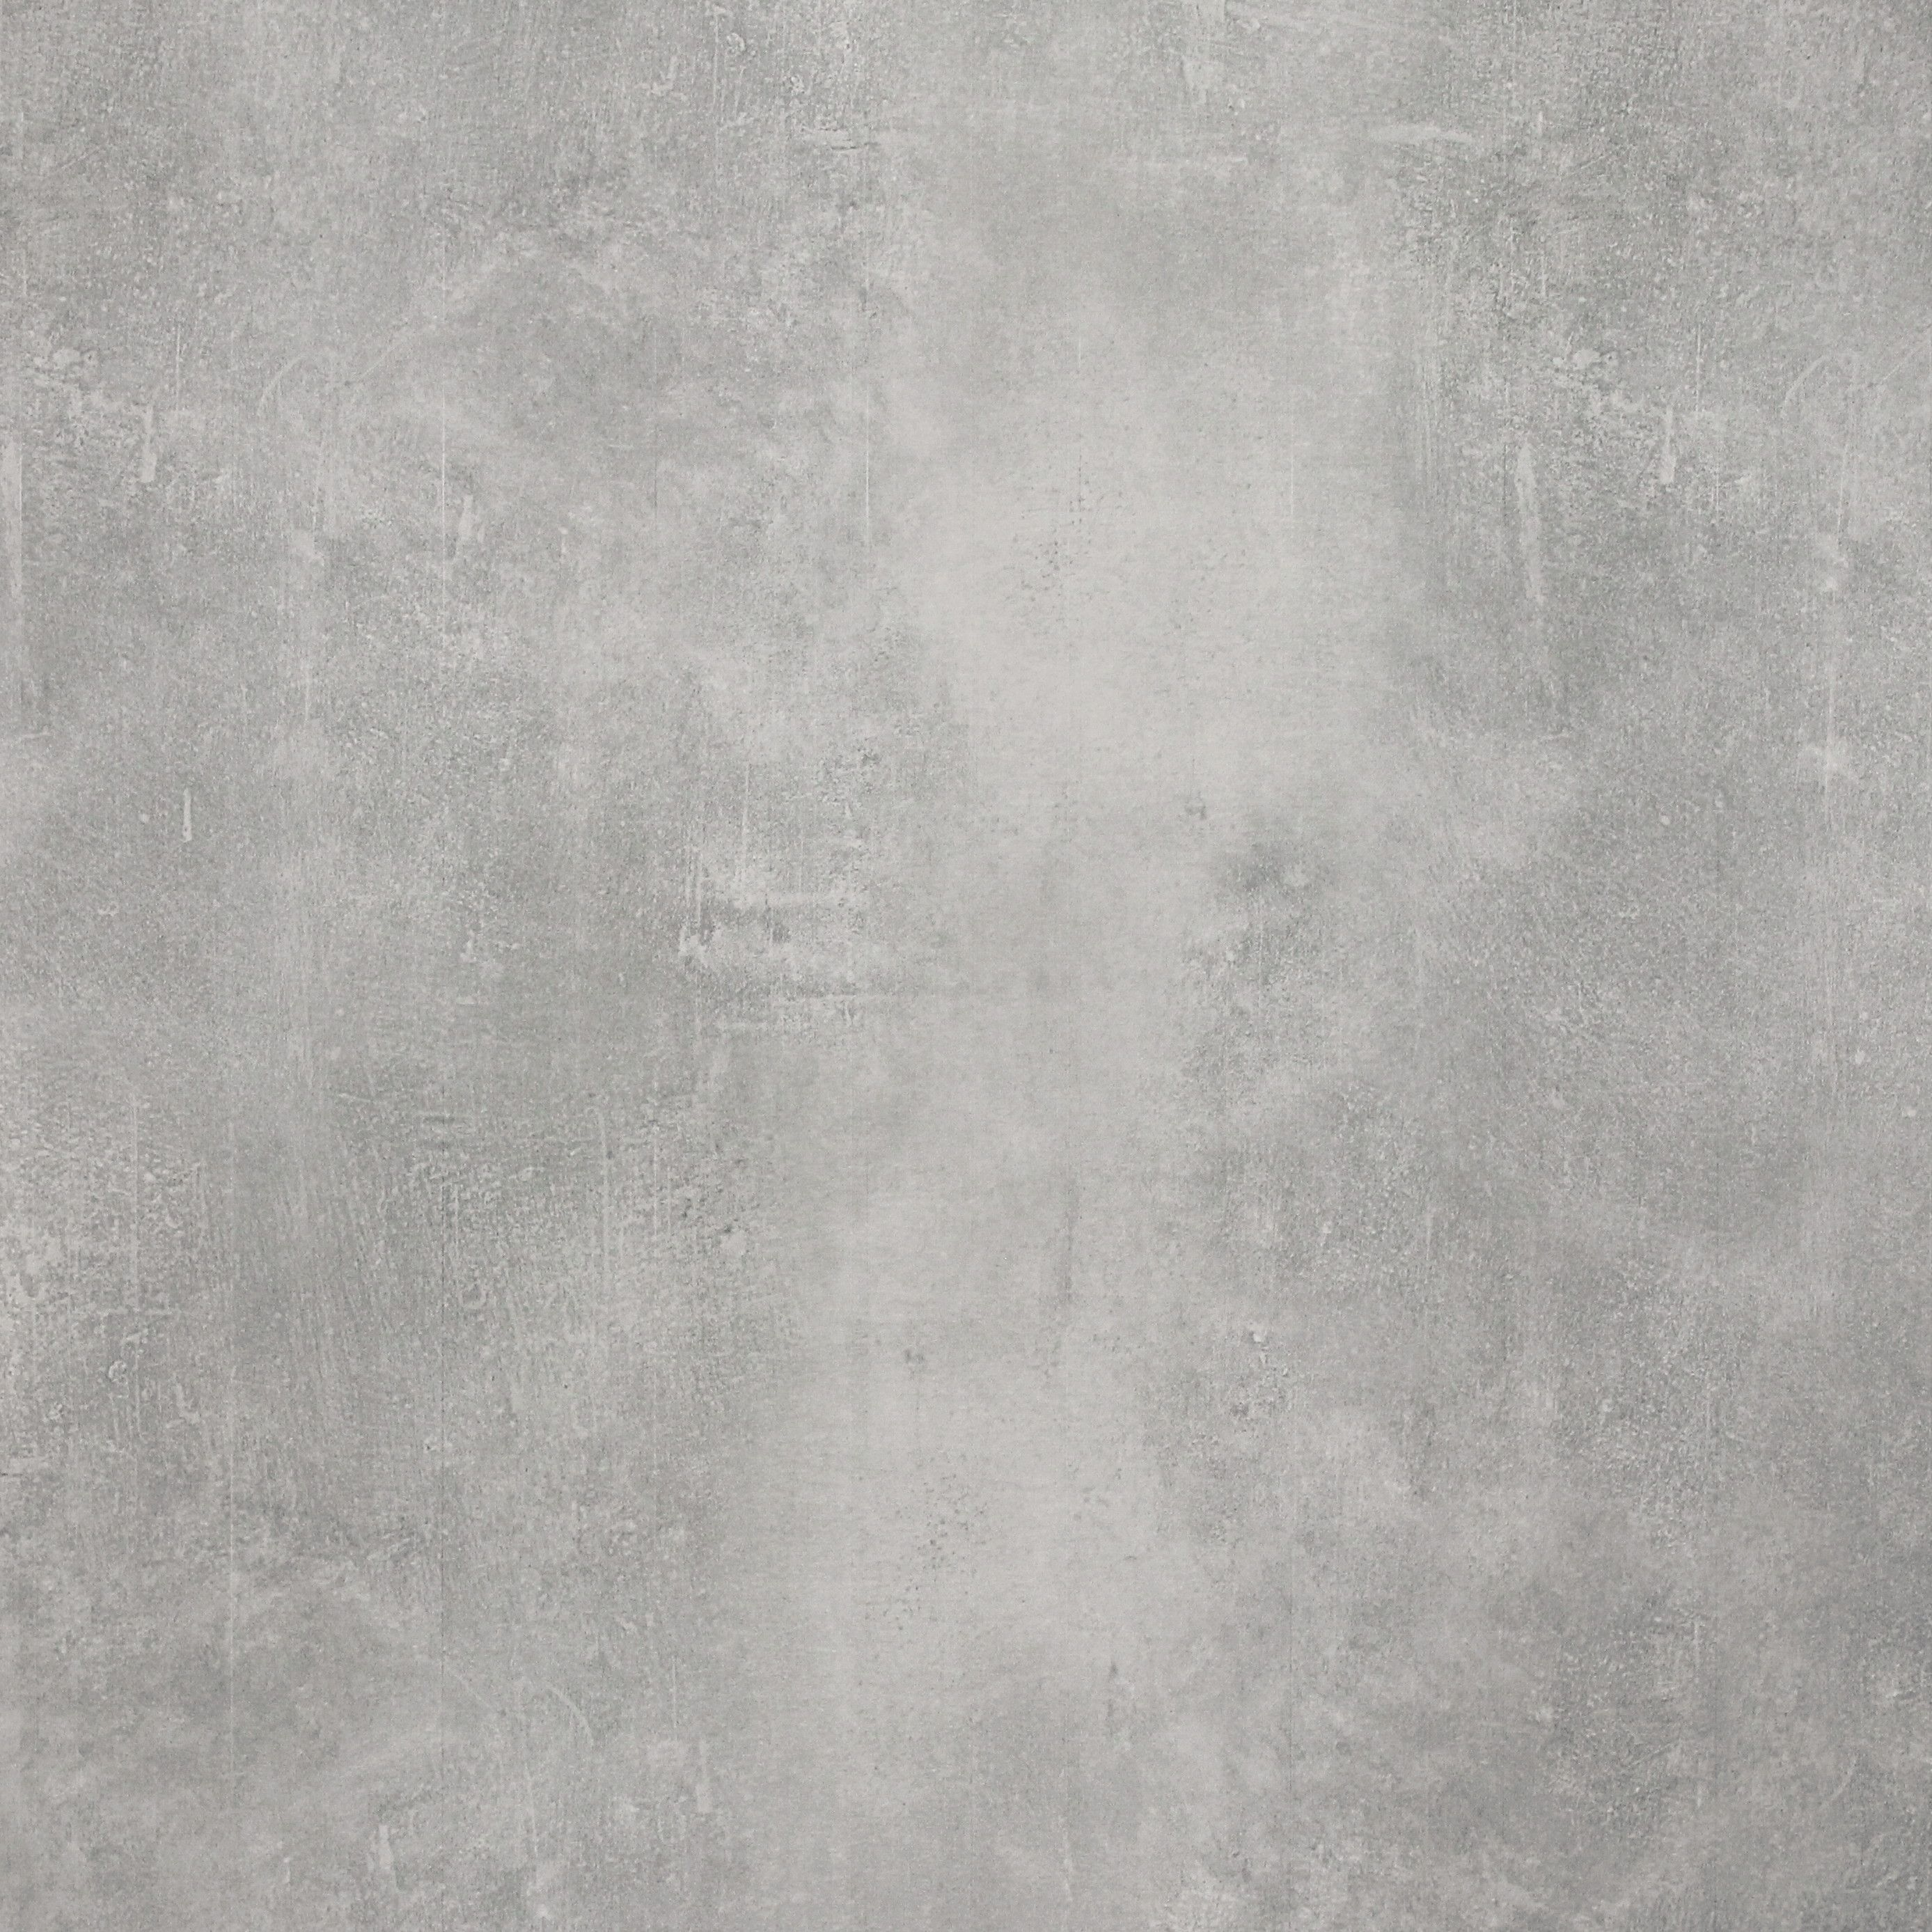 Fkeu Beton Grau Bodenfliese 60x60 Cm Graue Fliesenboden Bodenfliesen Fliesen Wohnzimmer